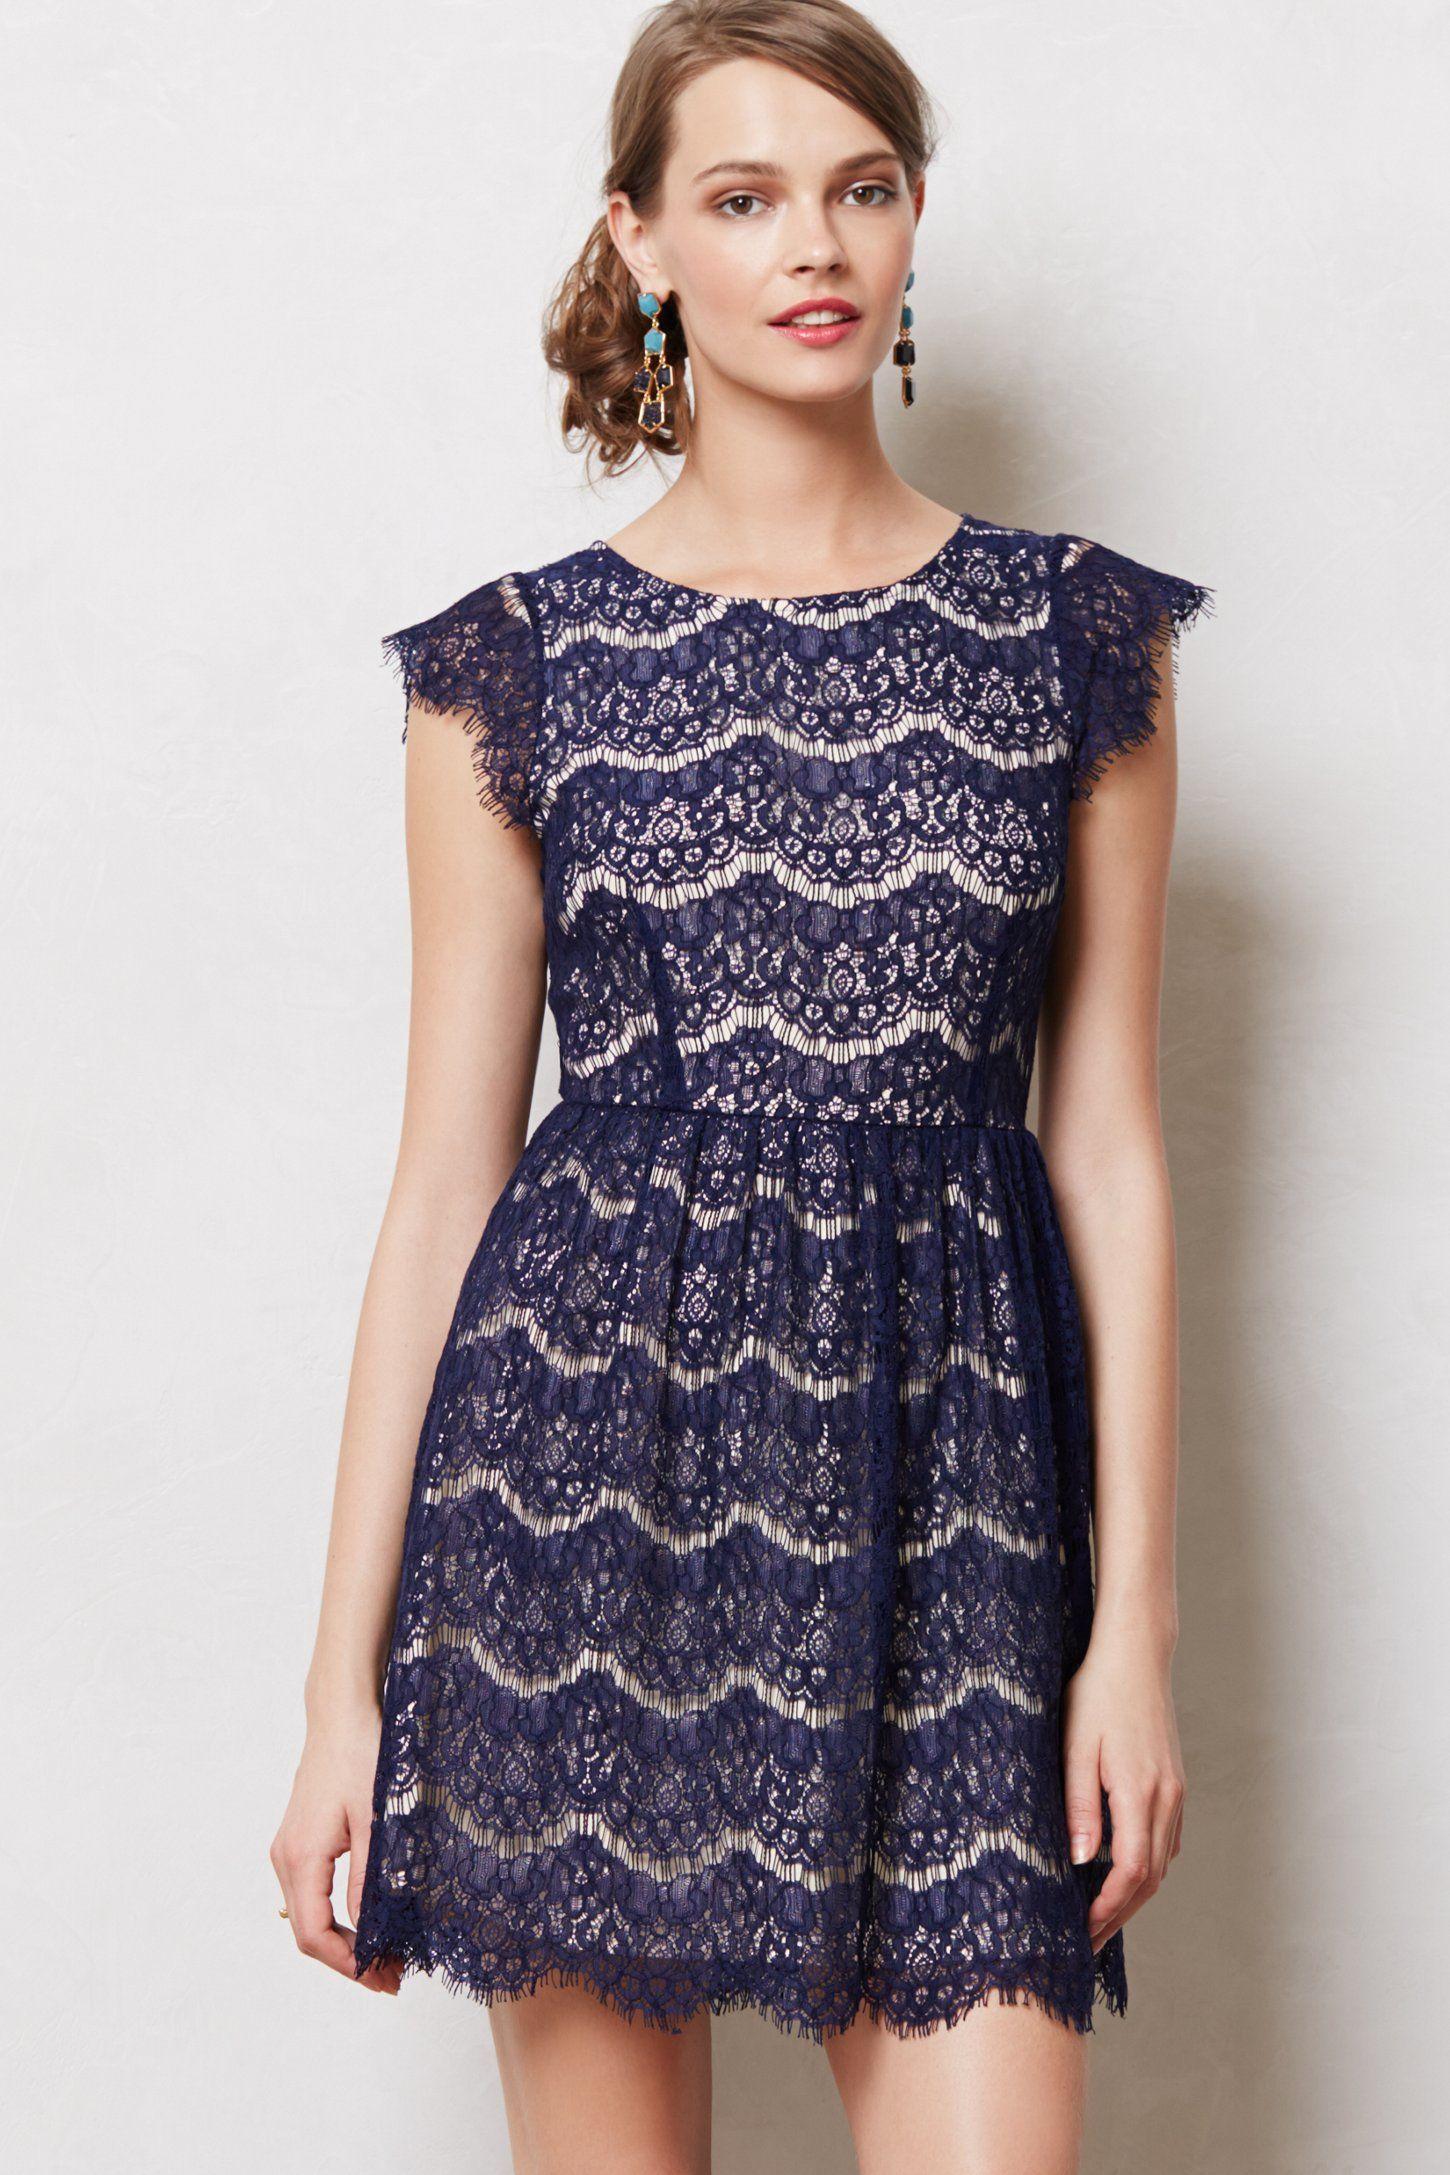 Lace dress navy  Nevicata Dress  Anthropologie  ClothesI love  Pinterest